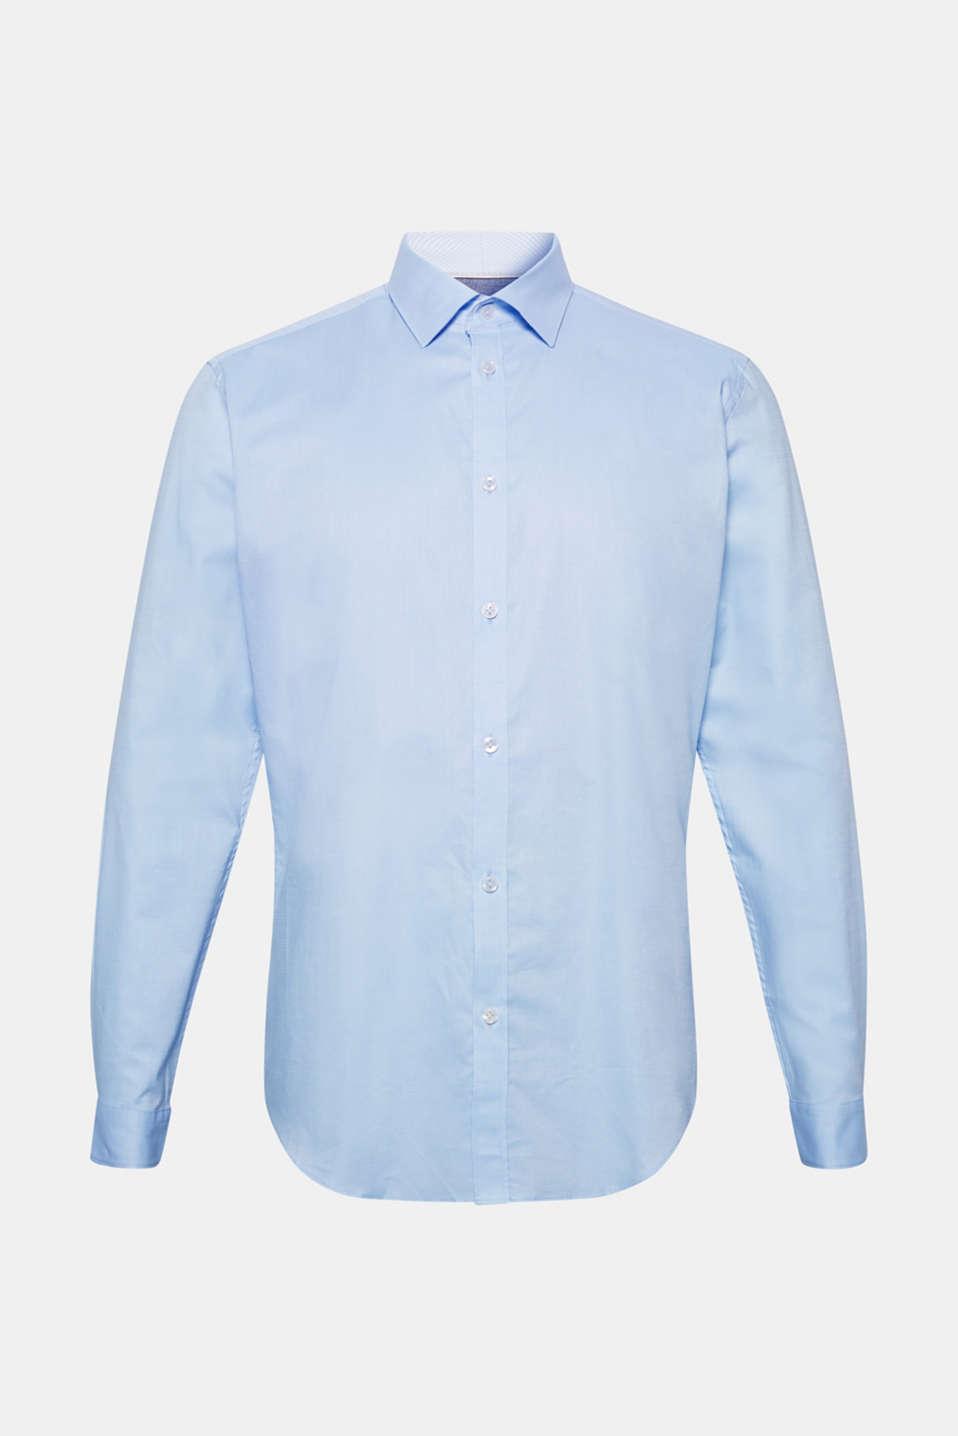 Shirts woven Slim fit, LIGHT BLUE, detail image number 8